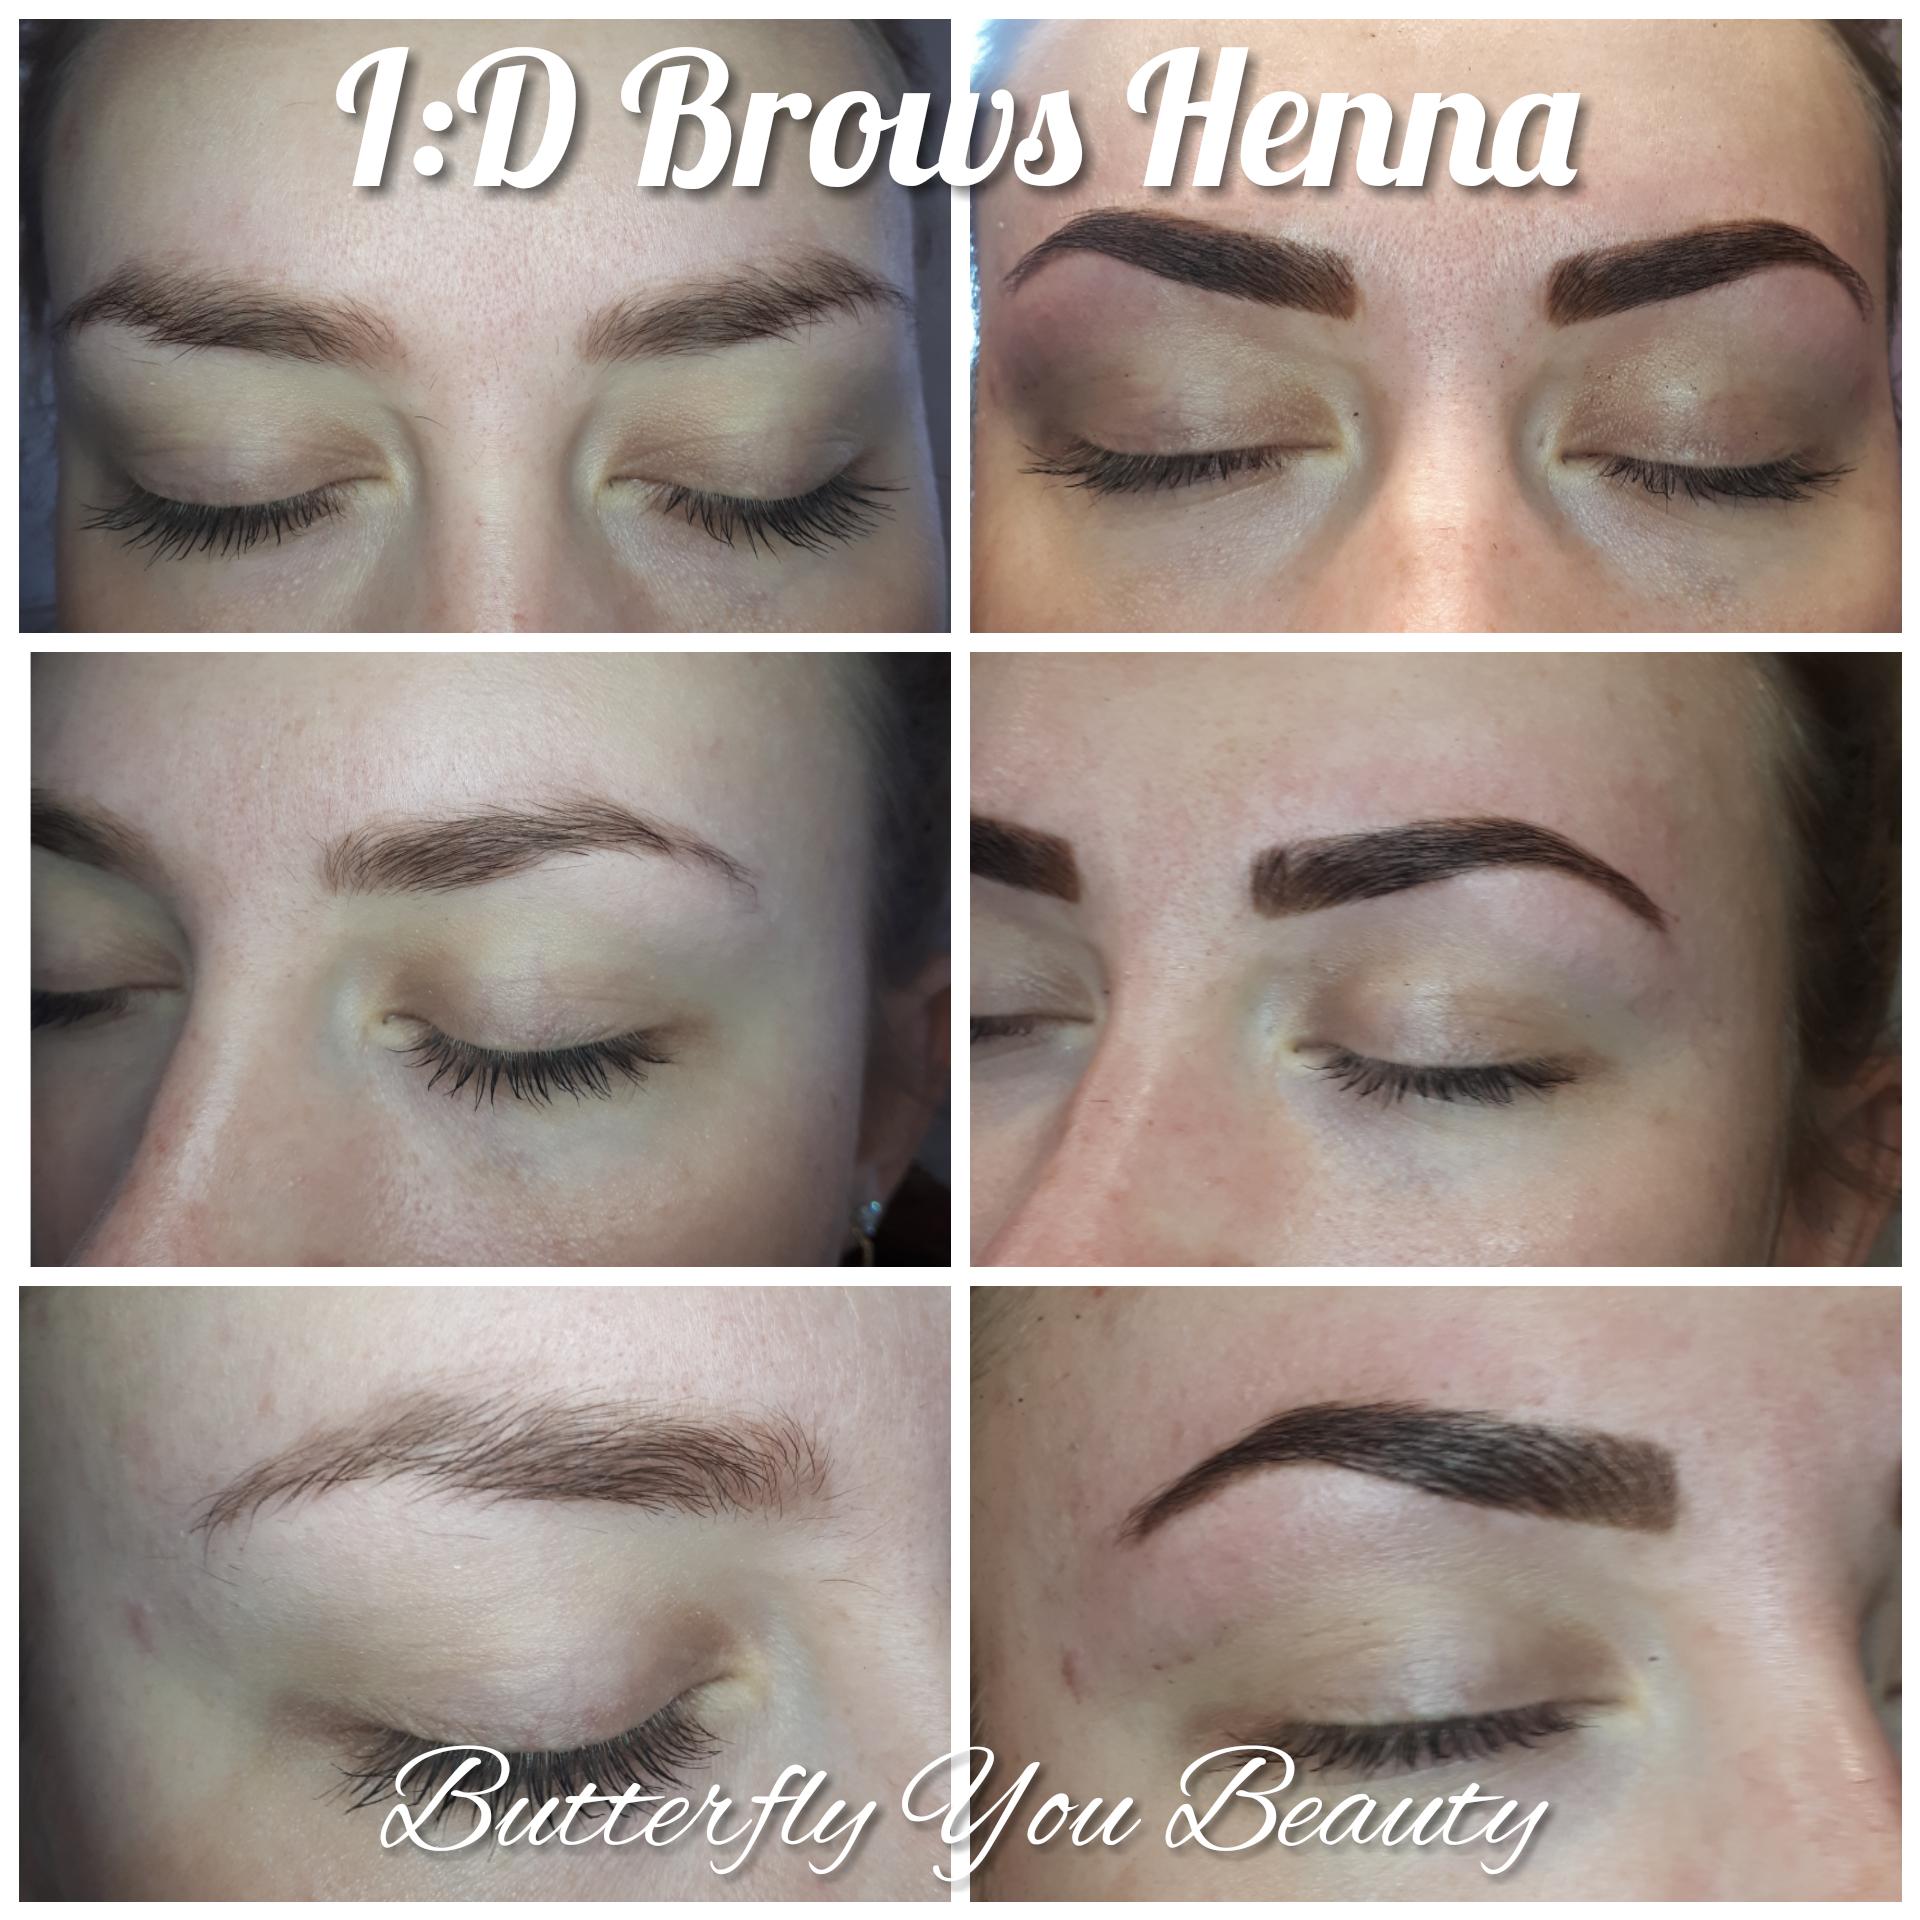 Henna Tattoo Eyebrow Course: Semi Permanent Makeup And